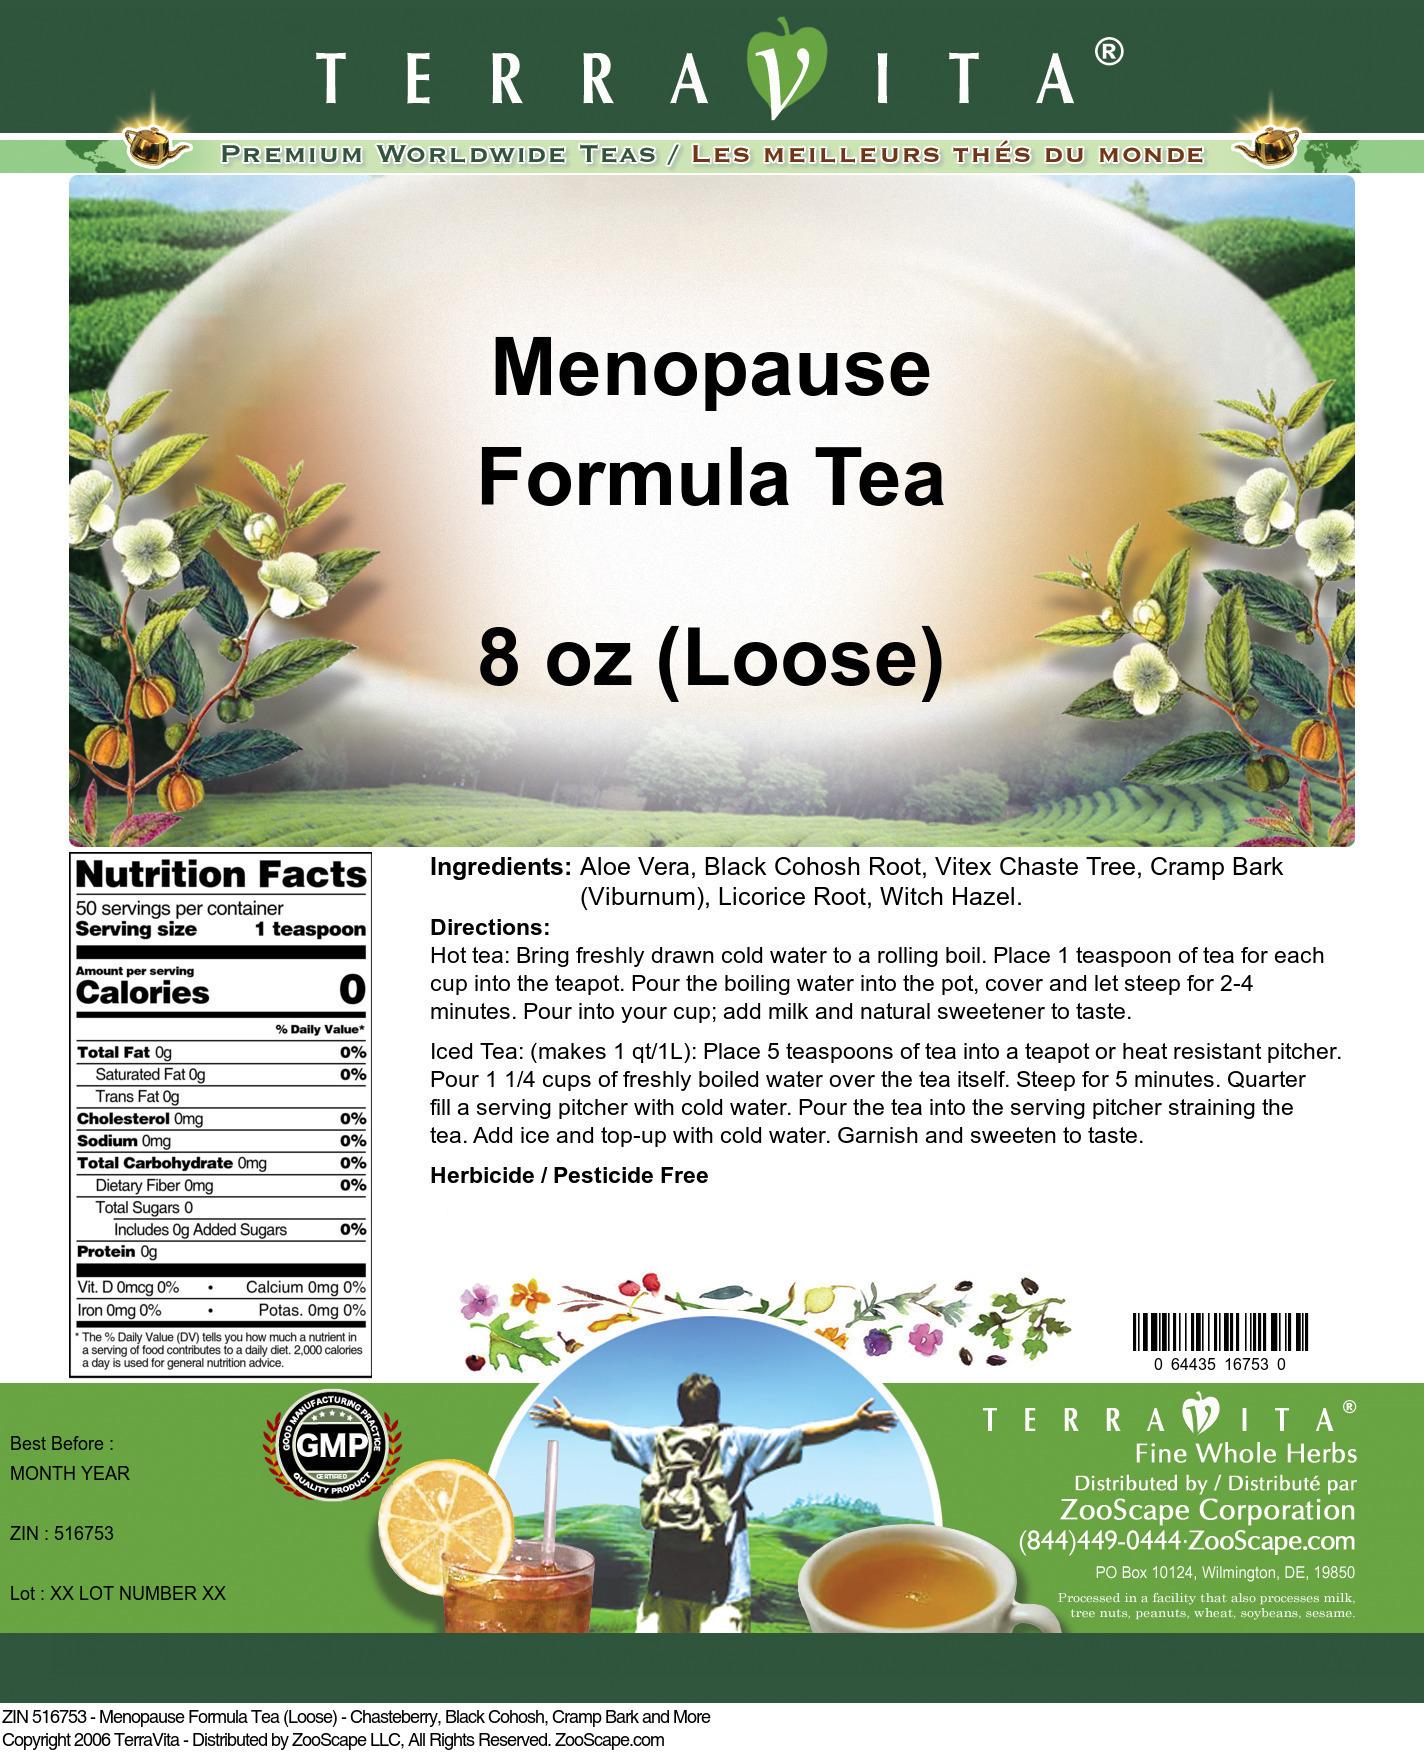 Menopause Formula Tea (Loose) - Chasteberry, Black Cohosh, Cramp Bark and More